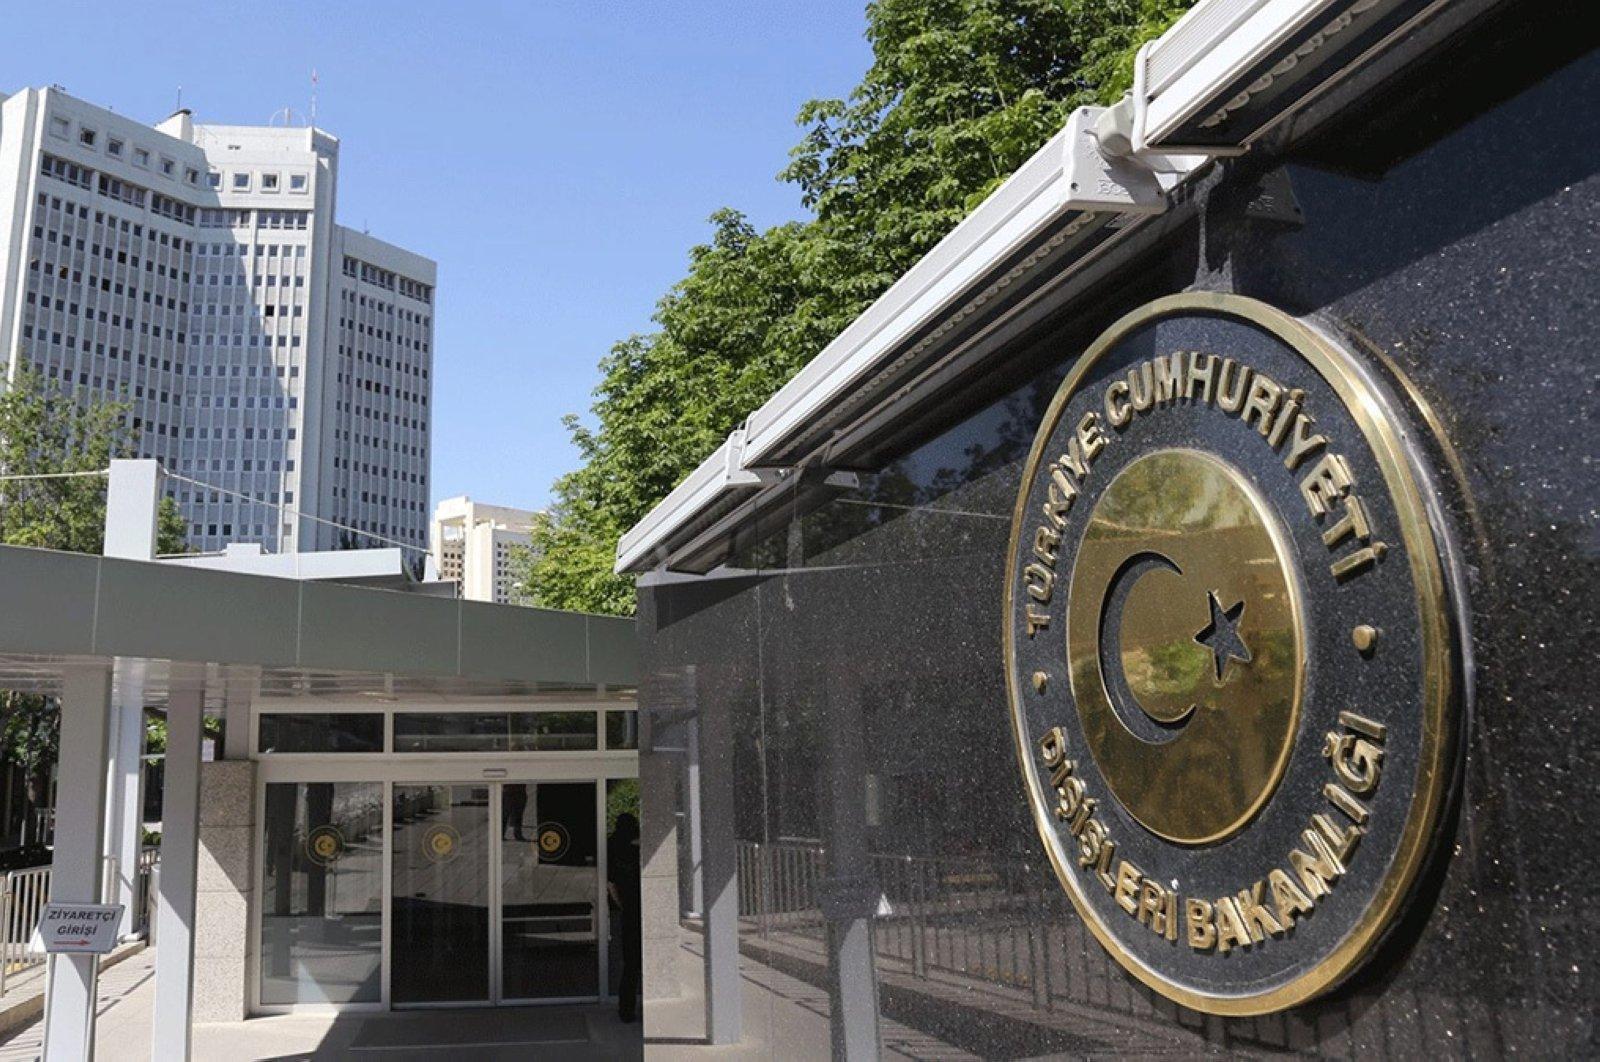 Turkey urges world to hold Assad accountable for Saraqib attack